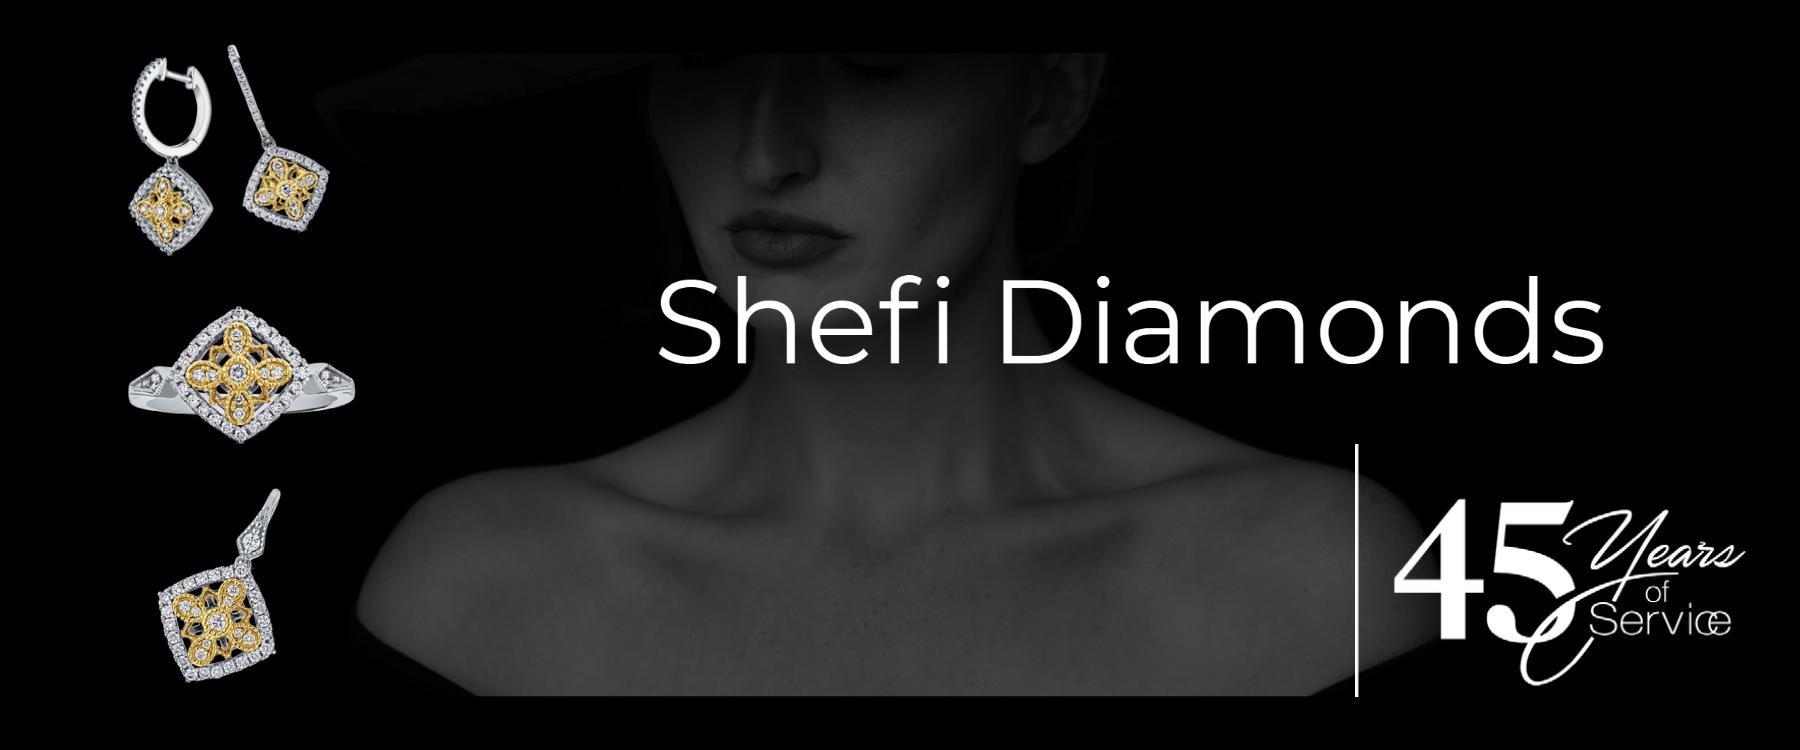 SHEFI DIAMONDS